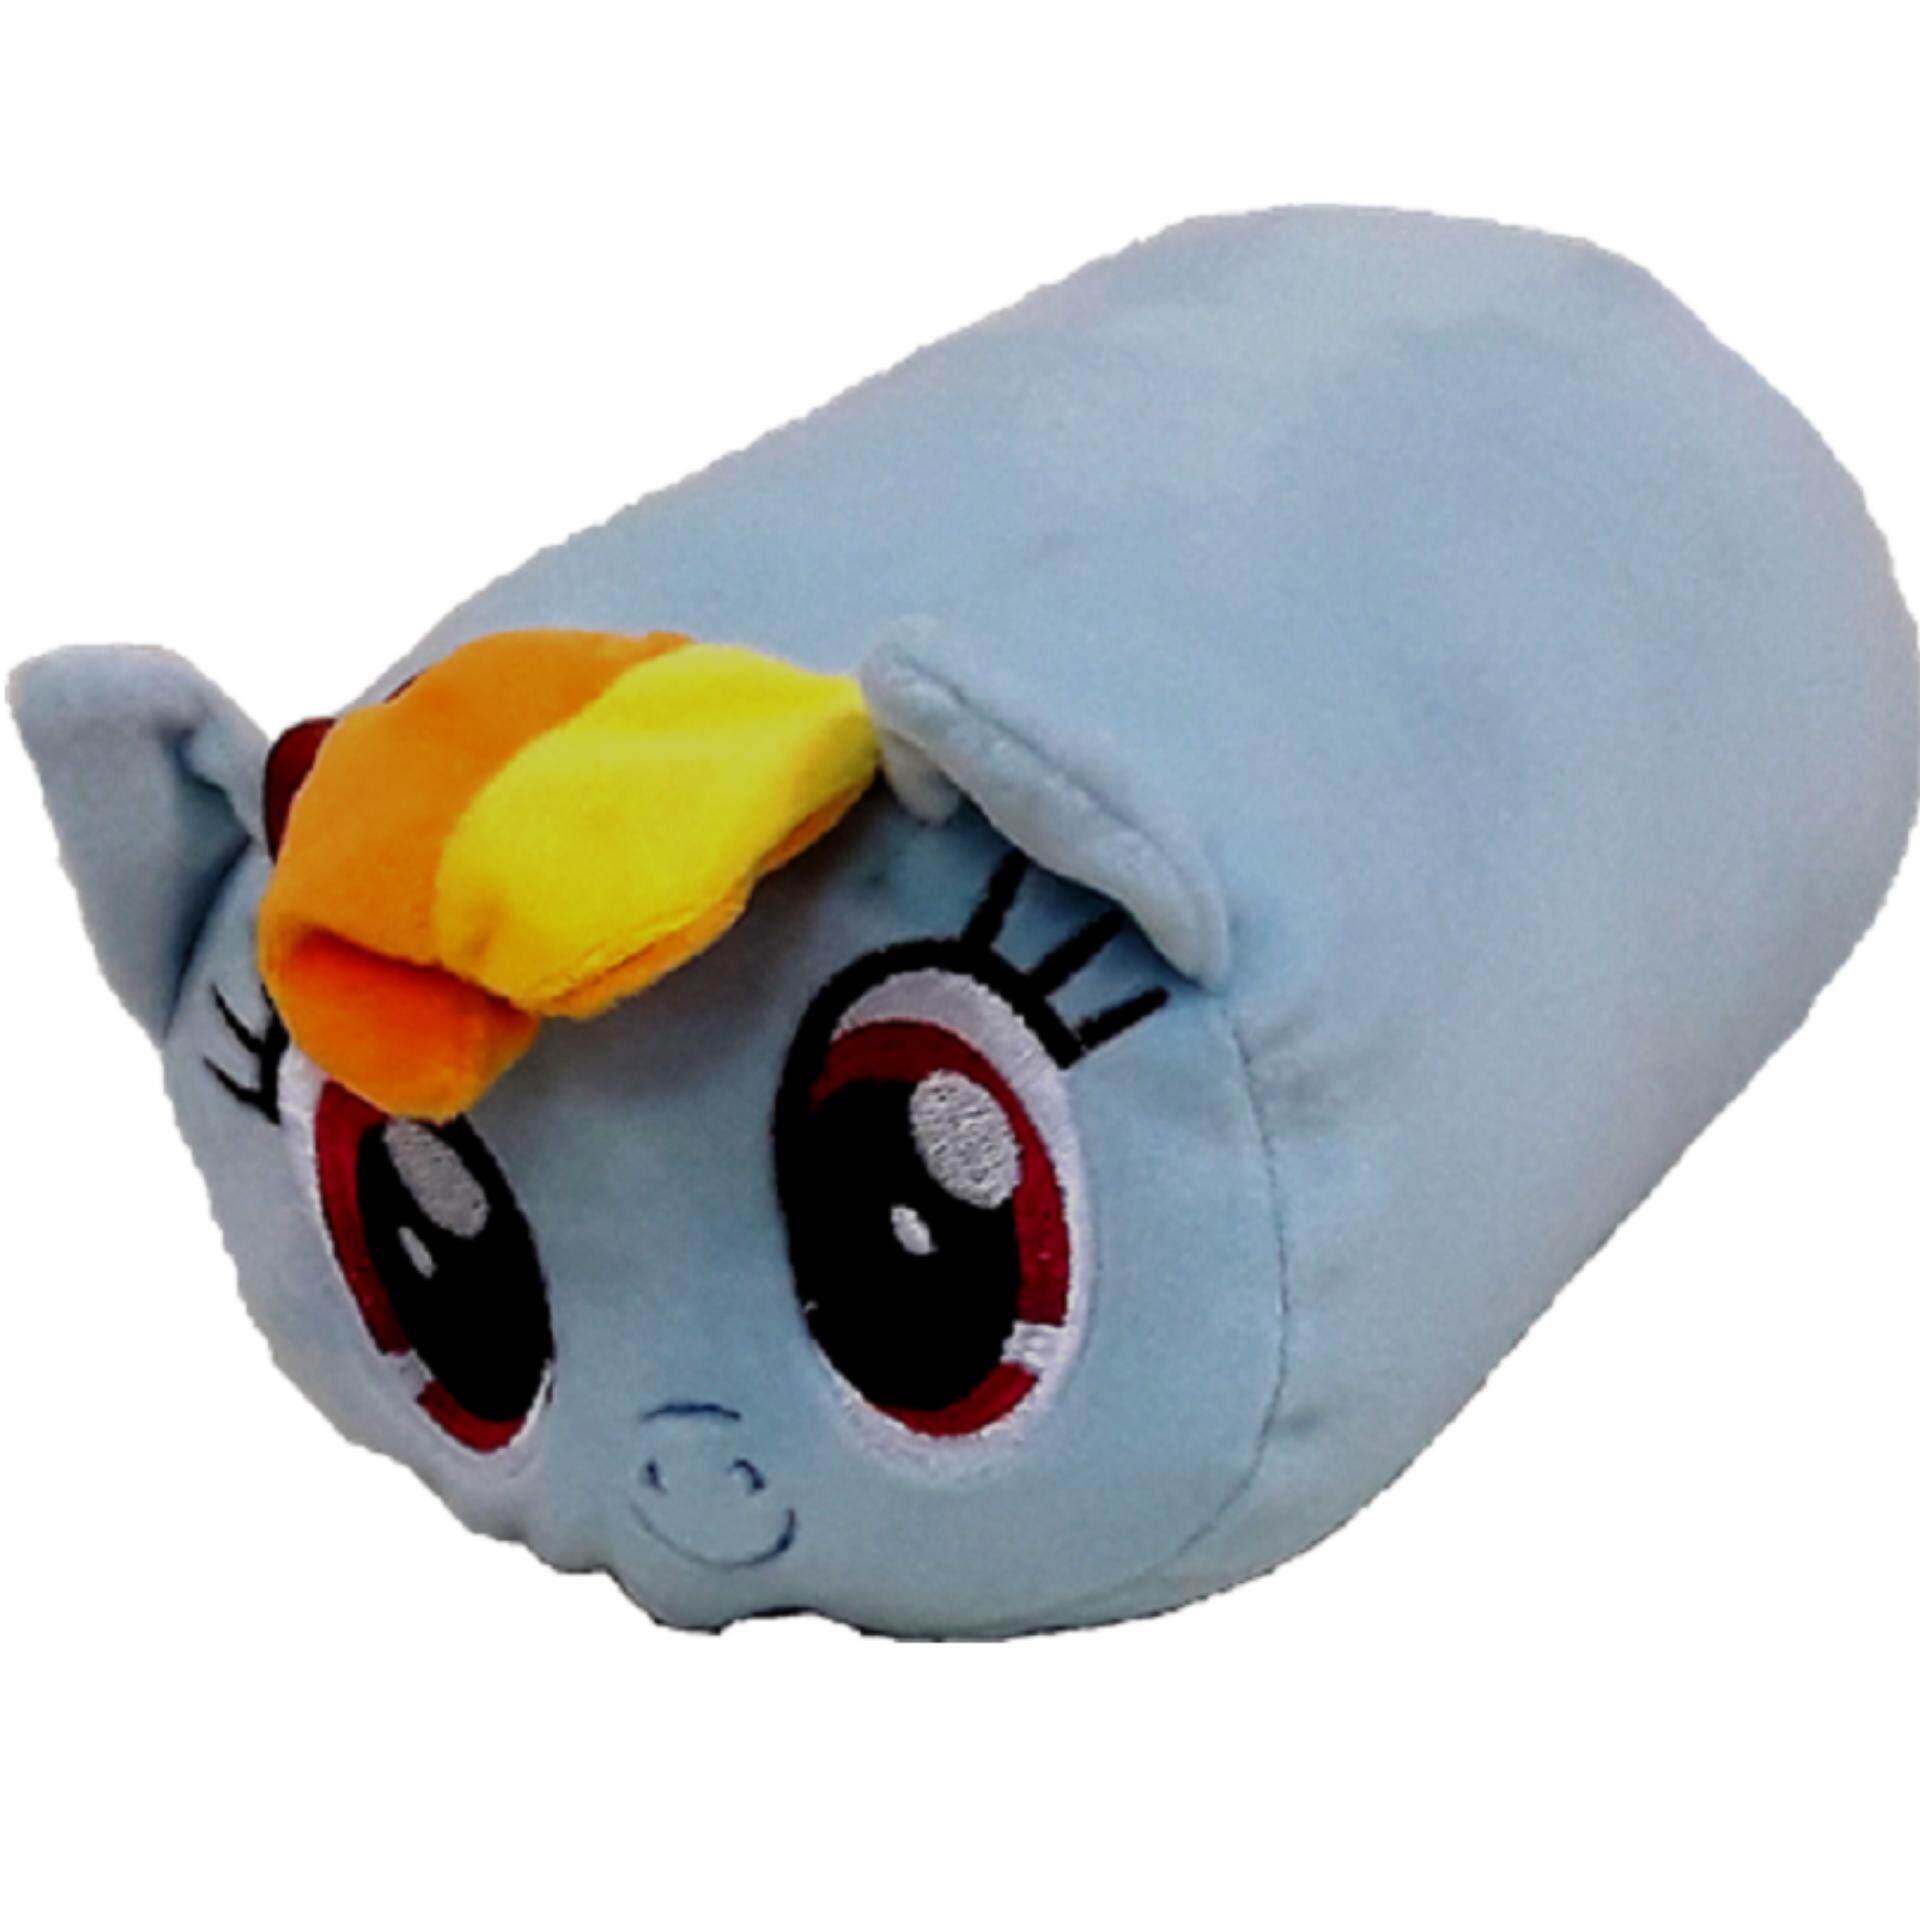 My Little Pony Mini Long Cushion - Rainbow Dash